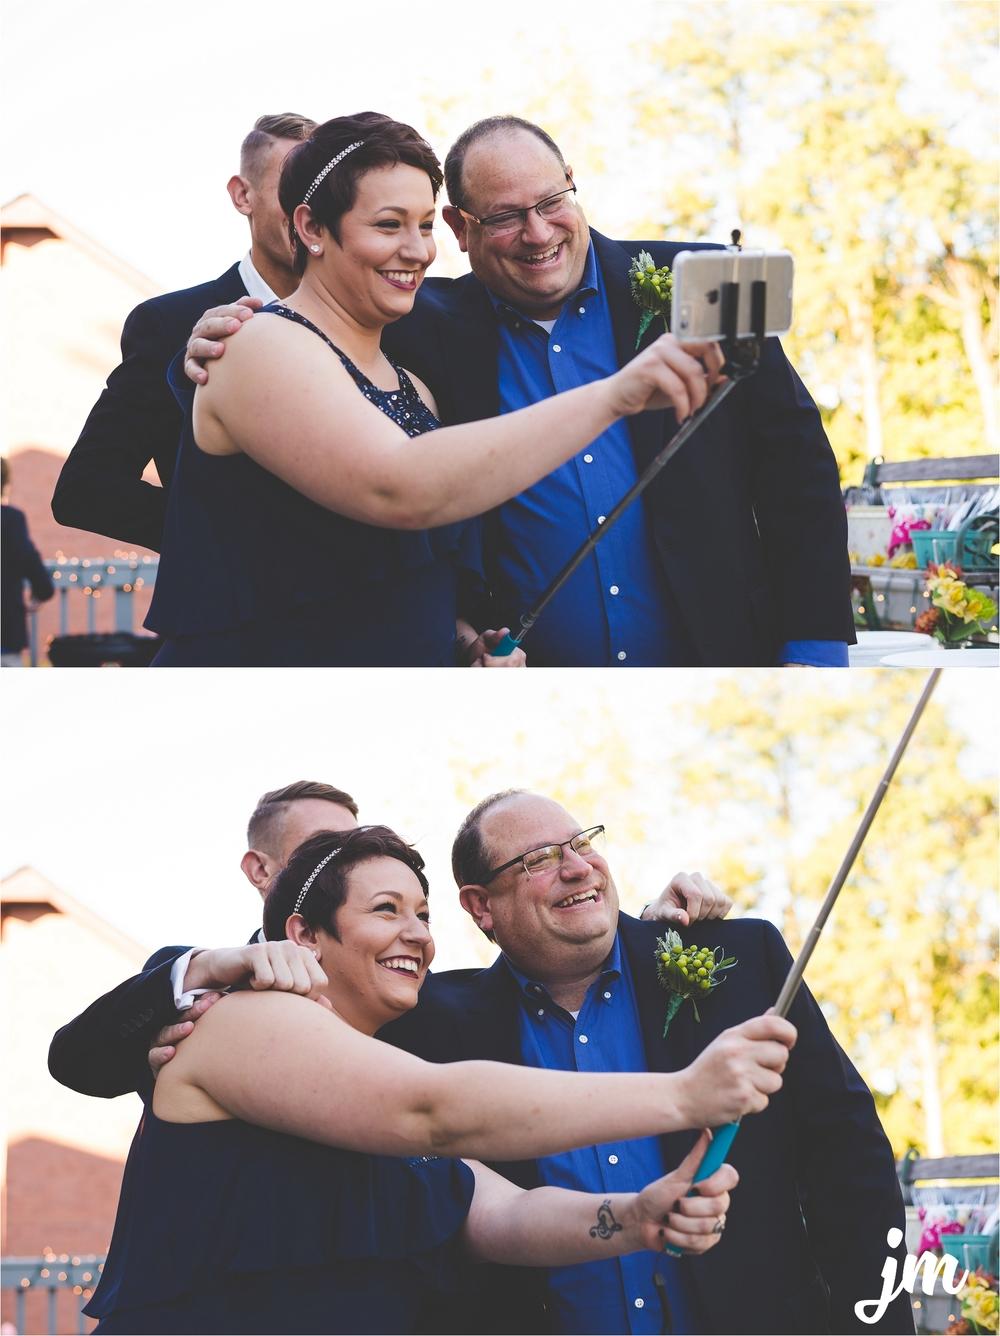 backyard-wedding-pacific-northwest-photographer-jannicka-mayte_0009.jpg